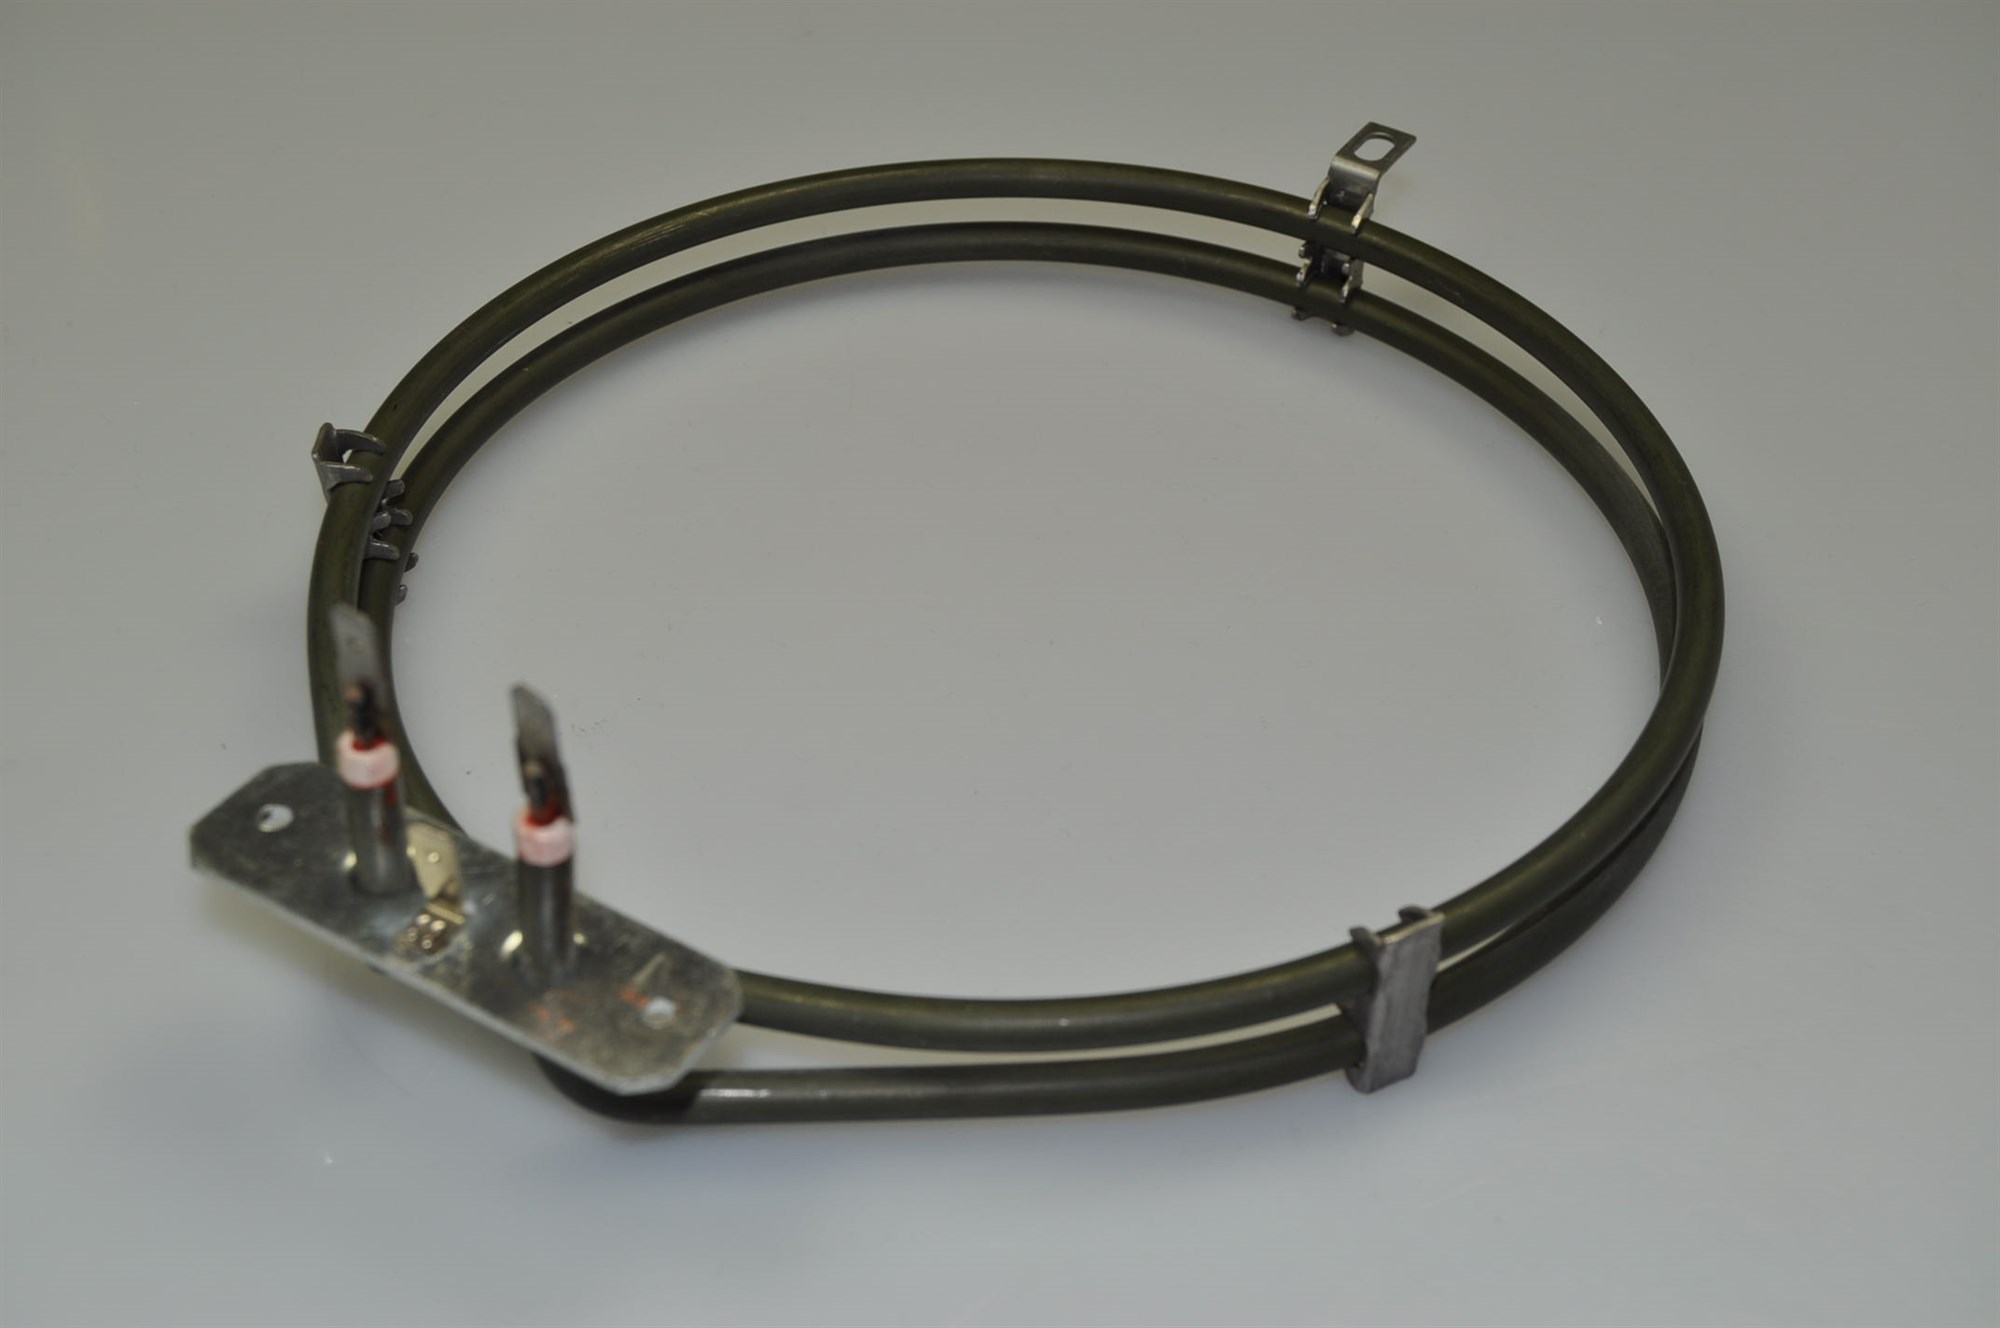 Circular Fan Oven Heating Element Smeg Cooker Amp Hobs